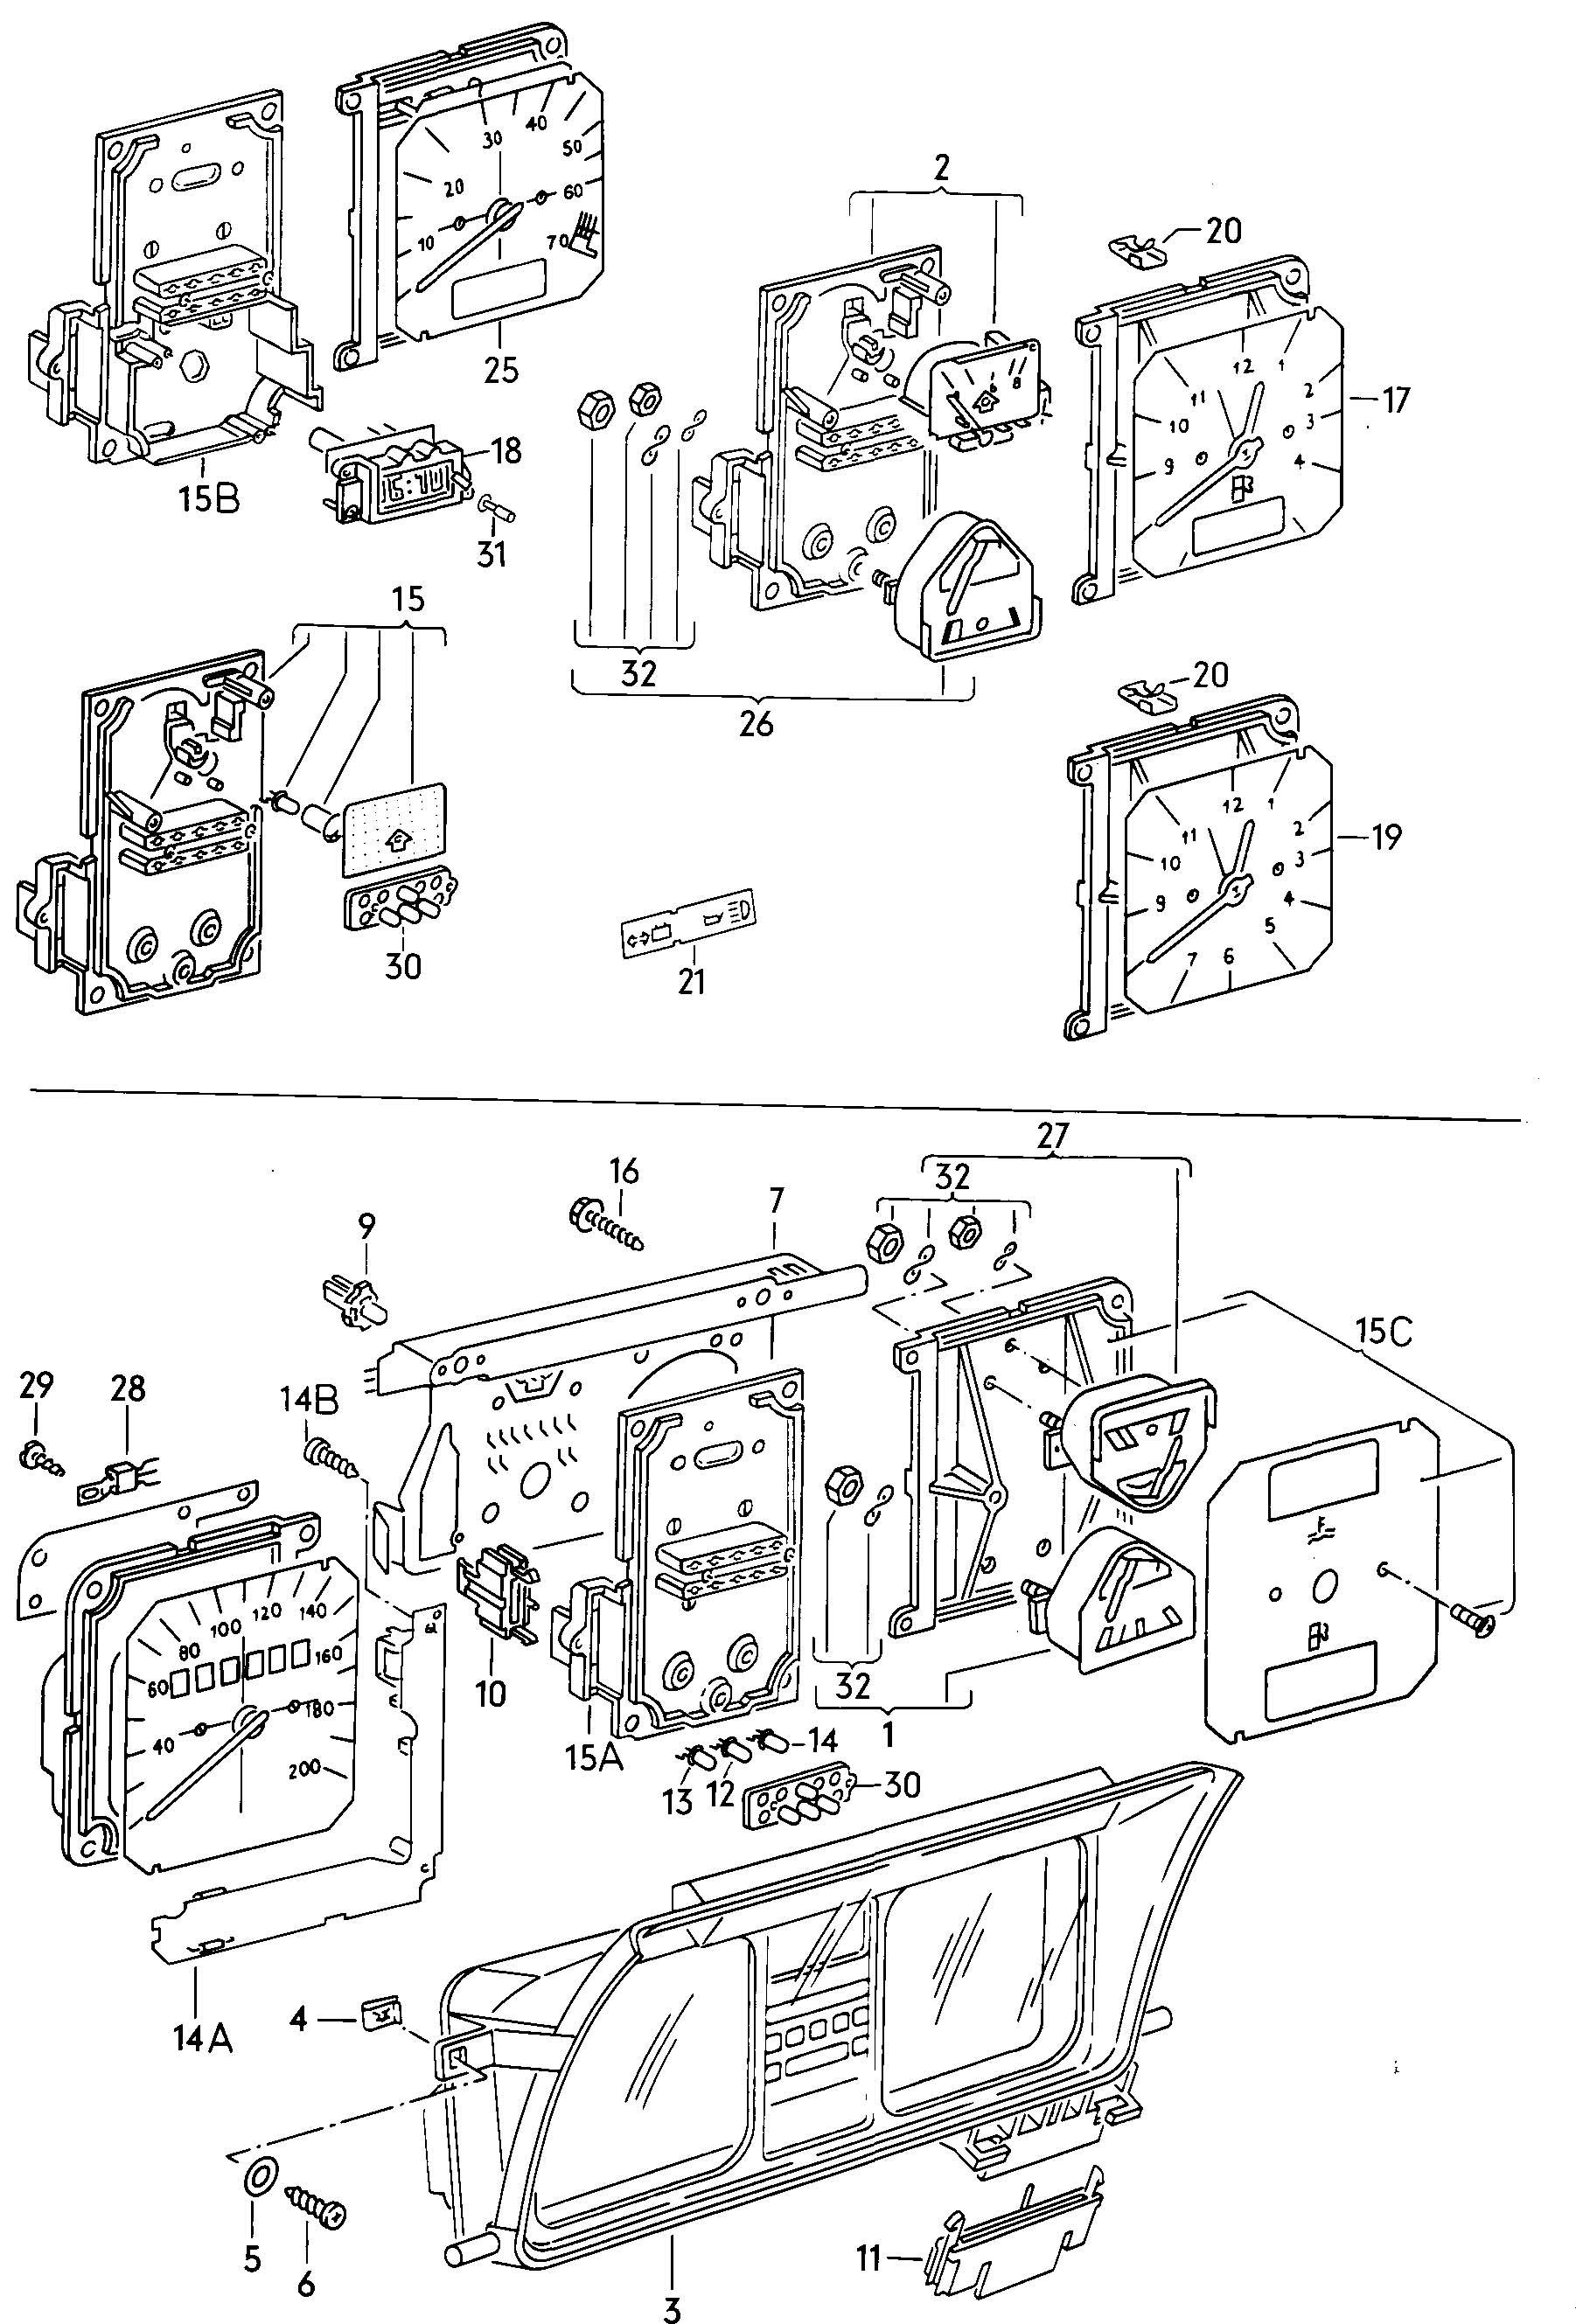 [DIAGRAM] Engine Diagram For 1988 Volkswagen Cabriolet